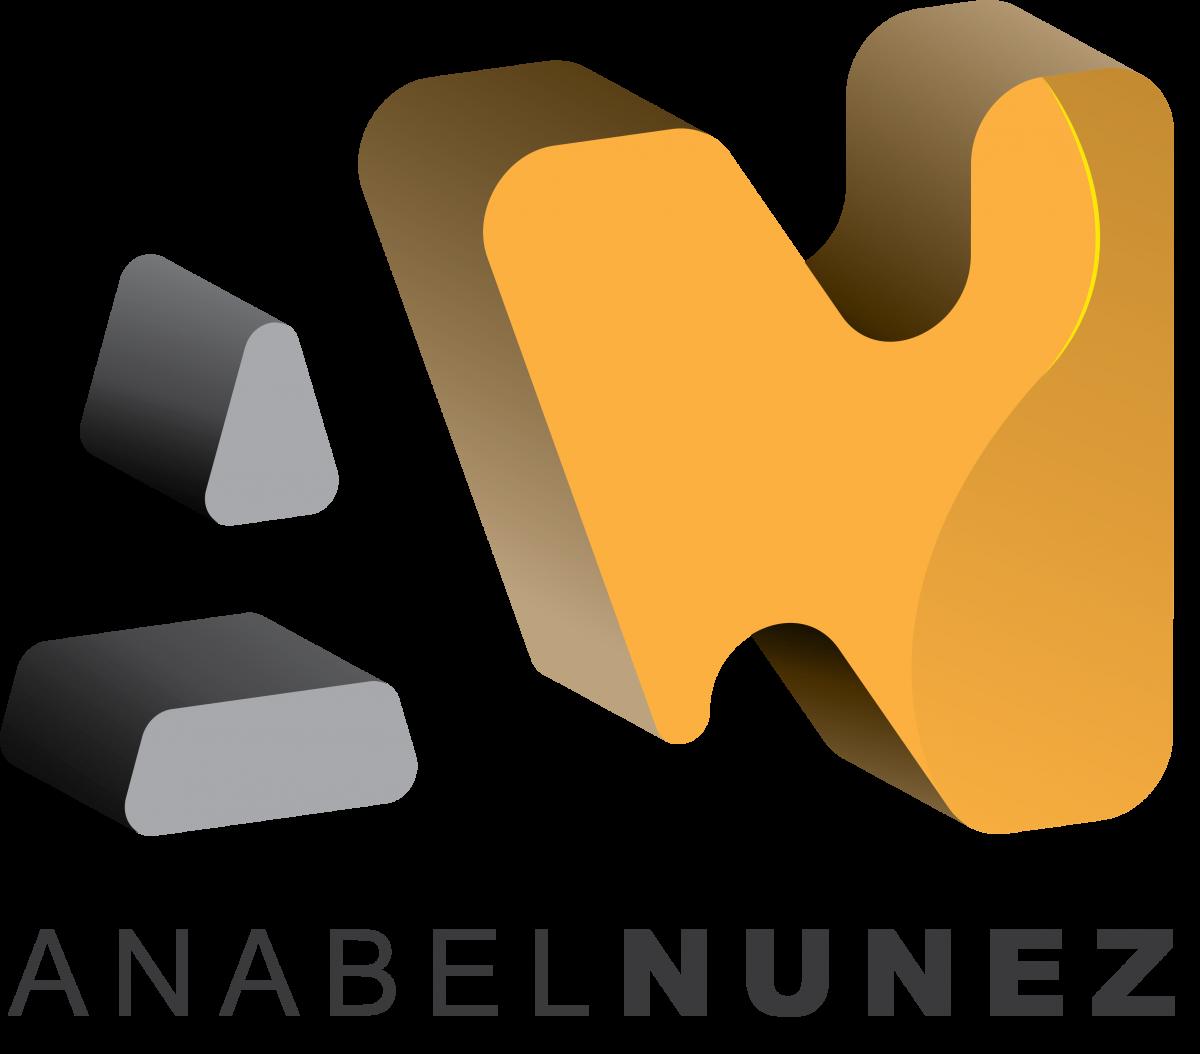 Anabel Nunez's ePortfolio